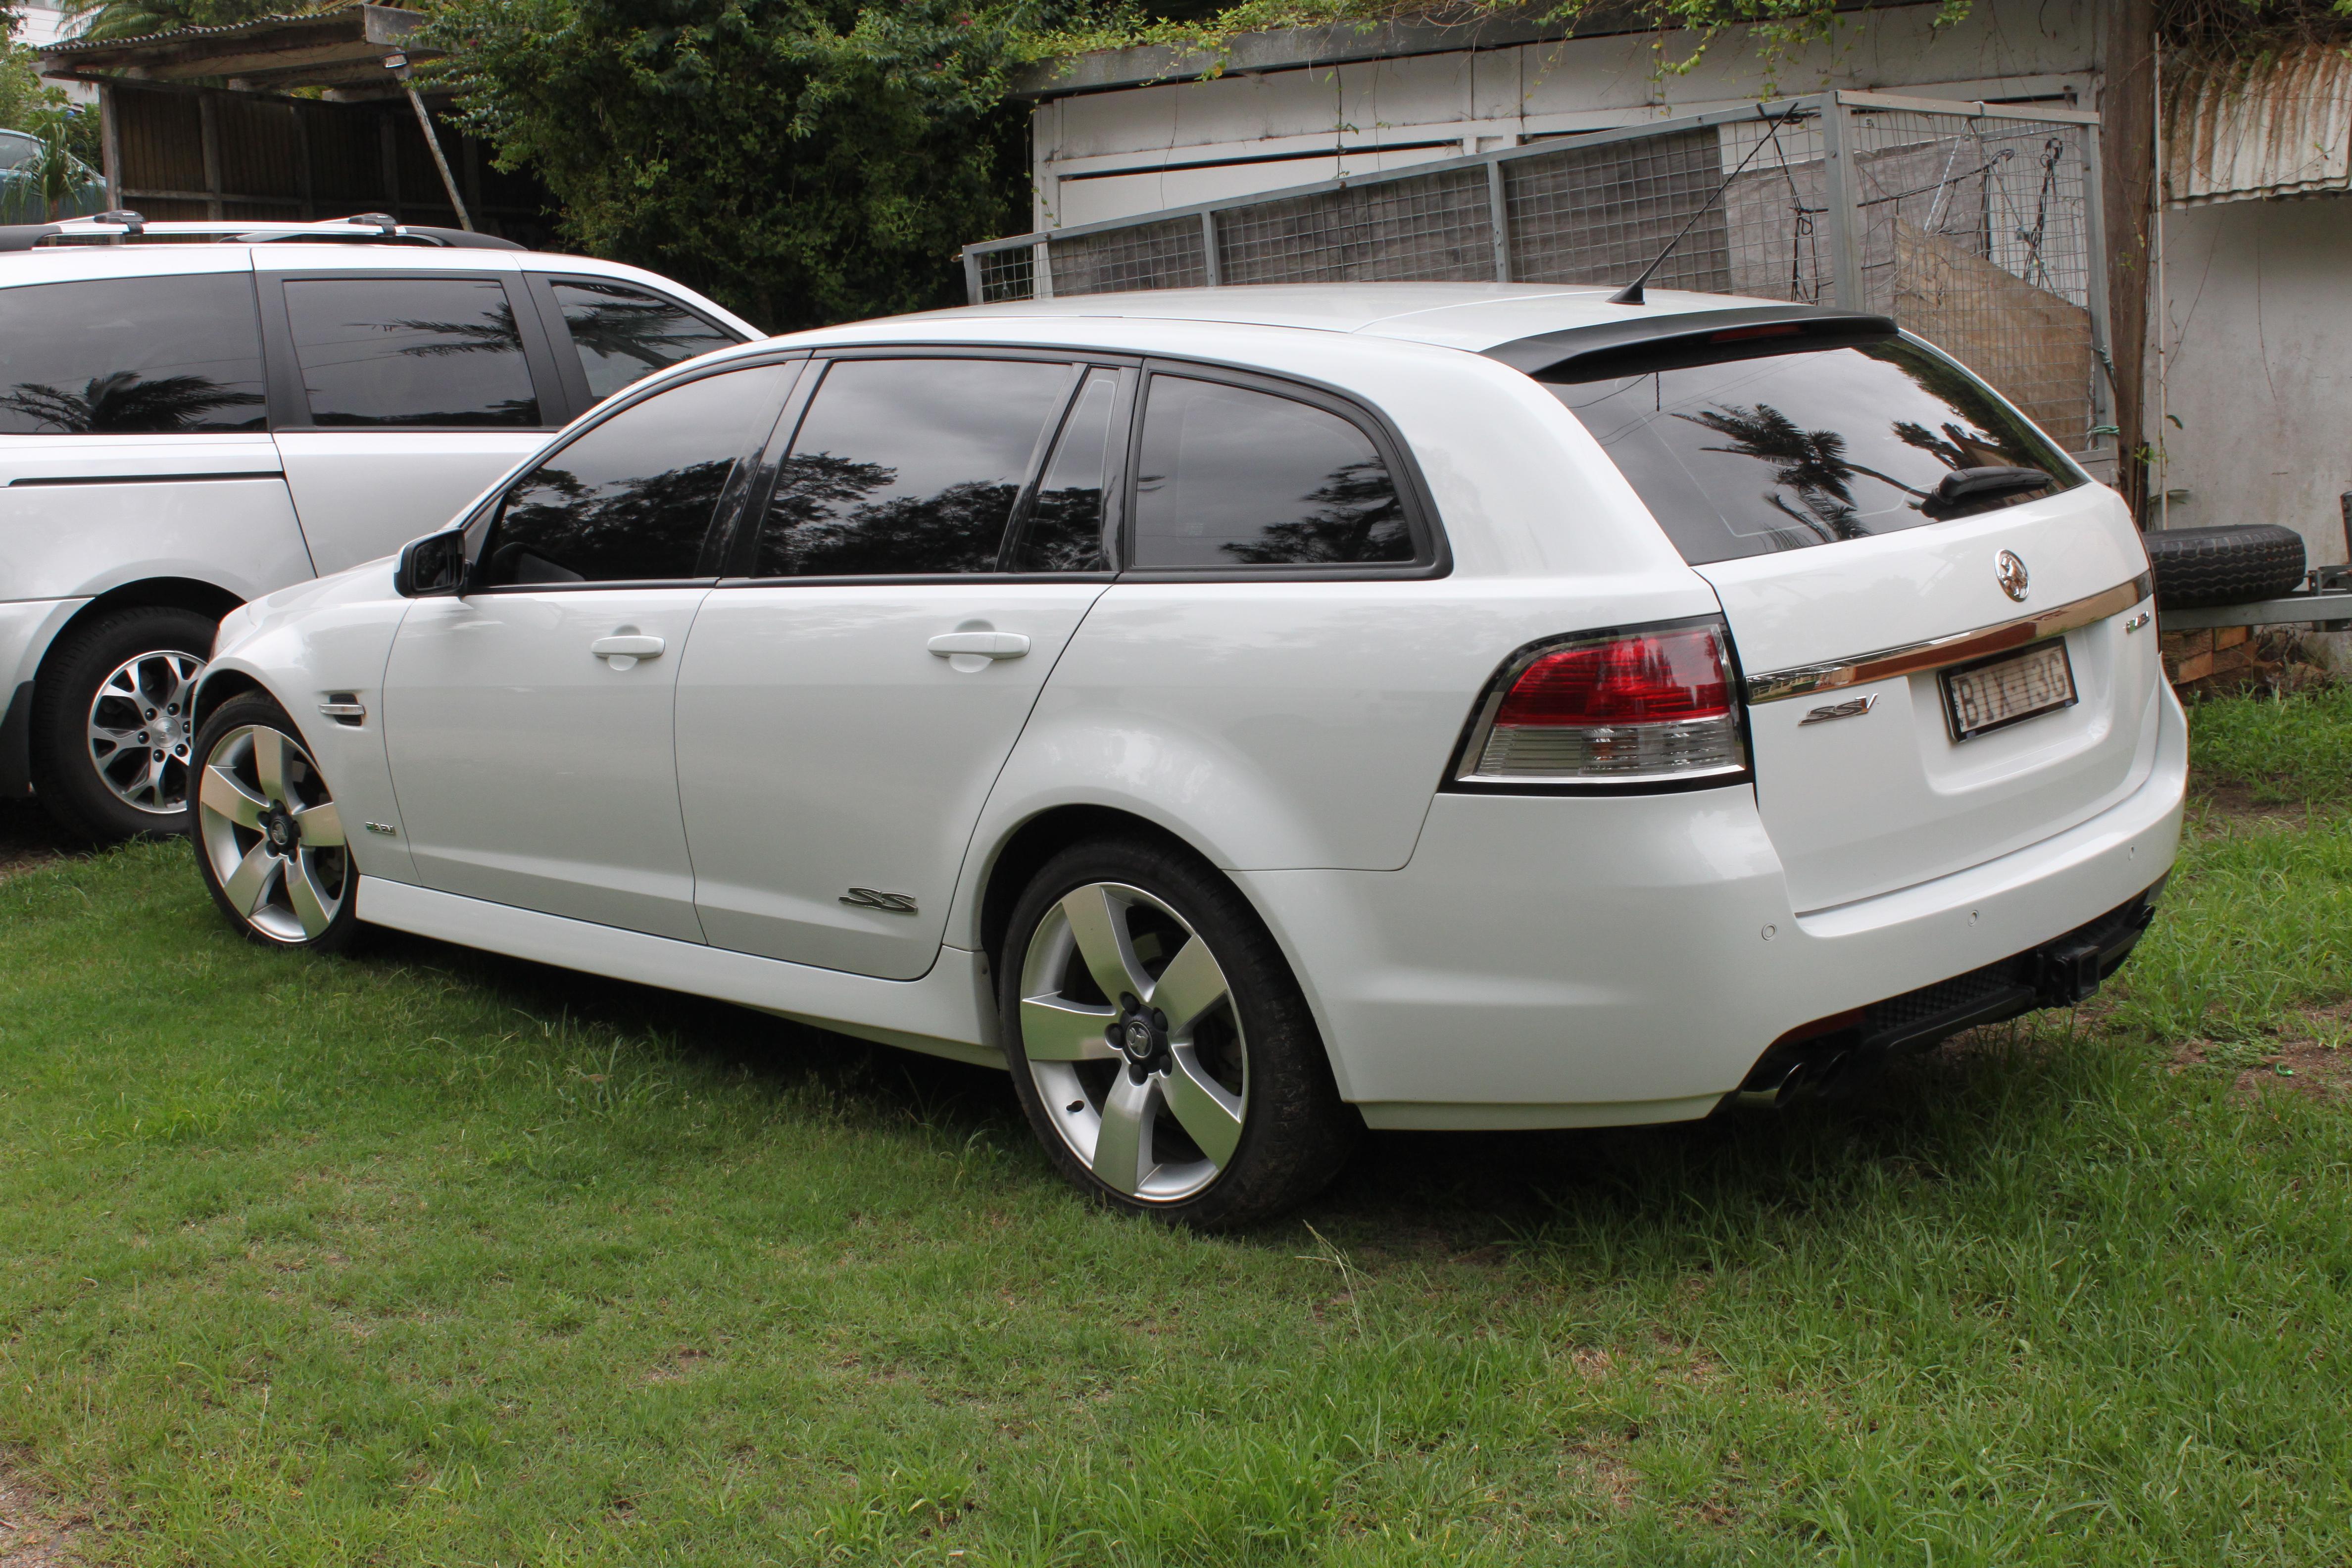 File2009 Holden Commodore VE SS V Sportwagon station wagon